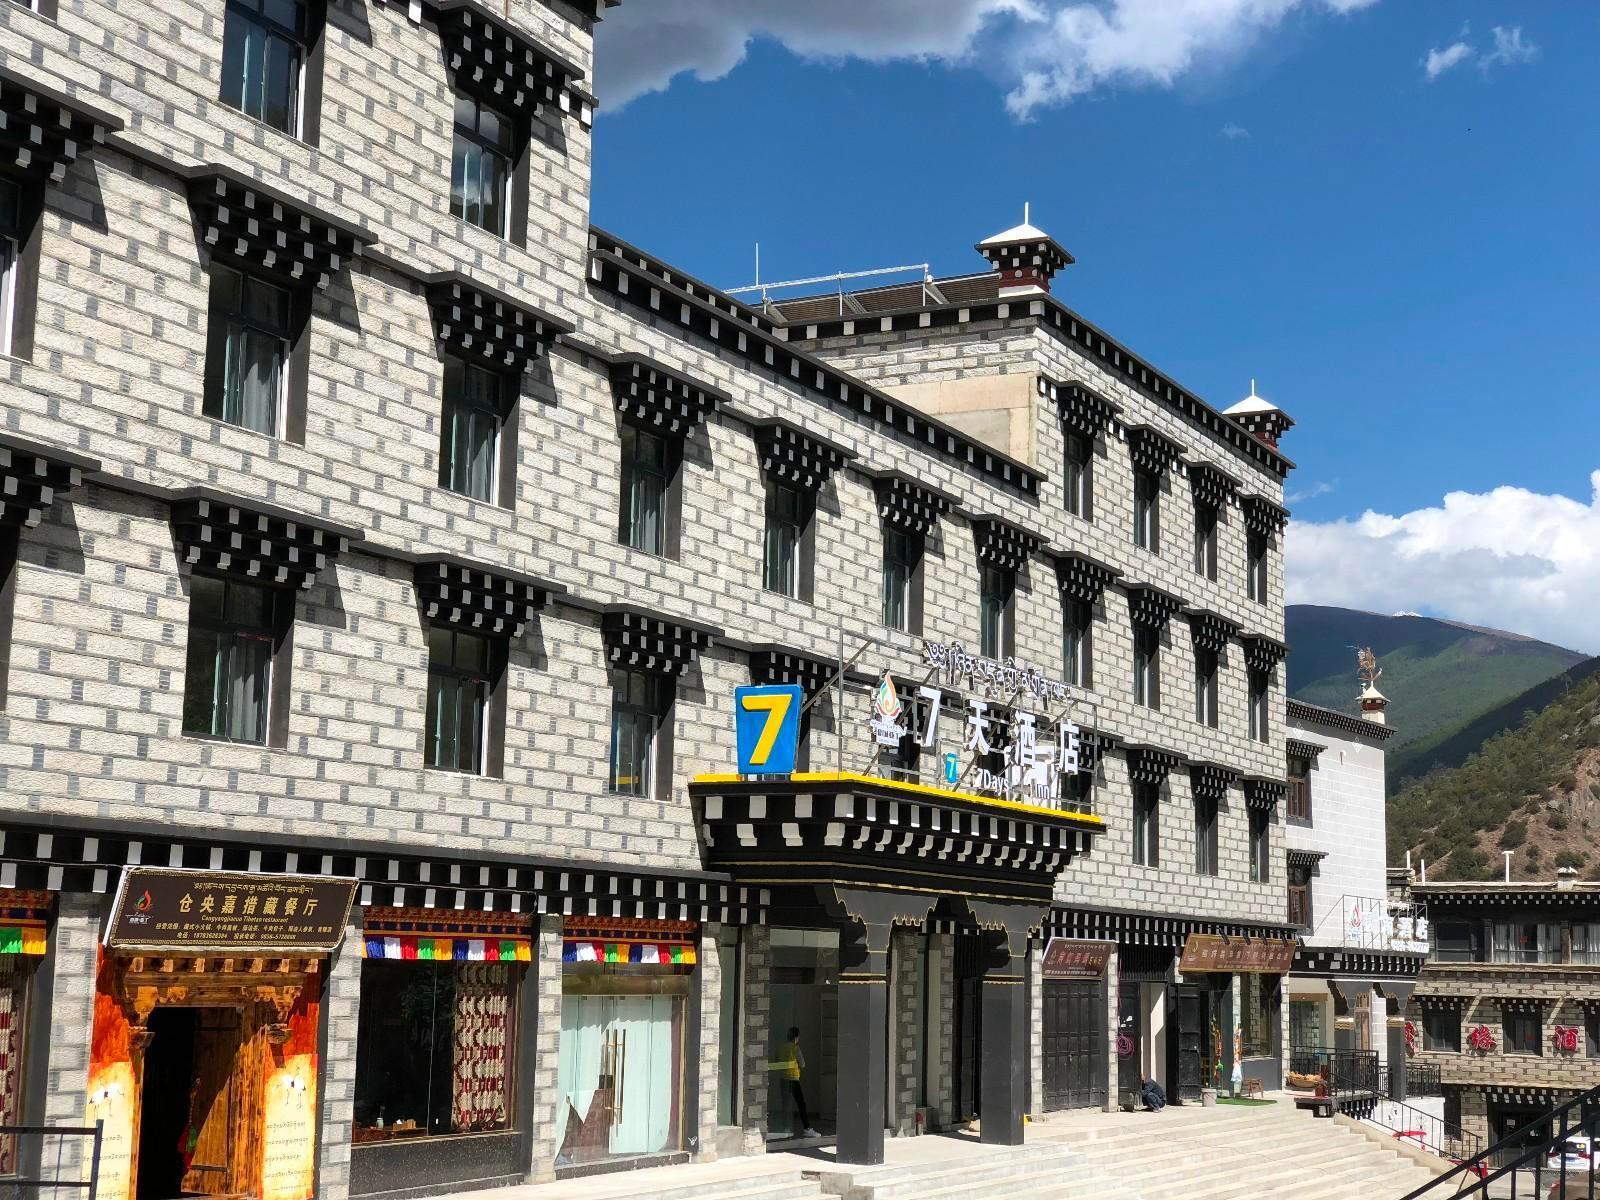 7 Days InnDaocheng Shangri La Yading Scenic Area